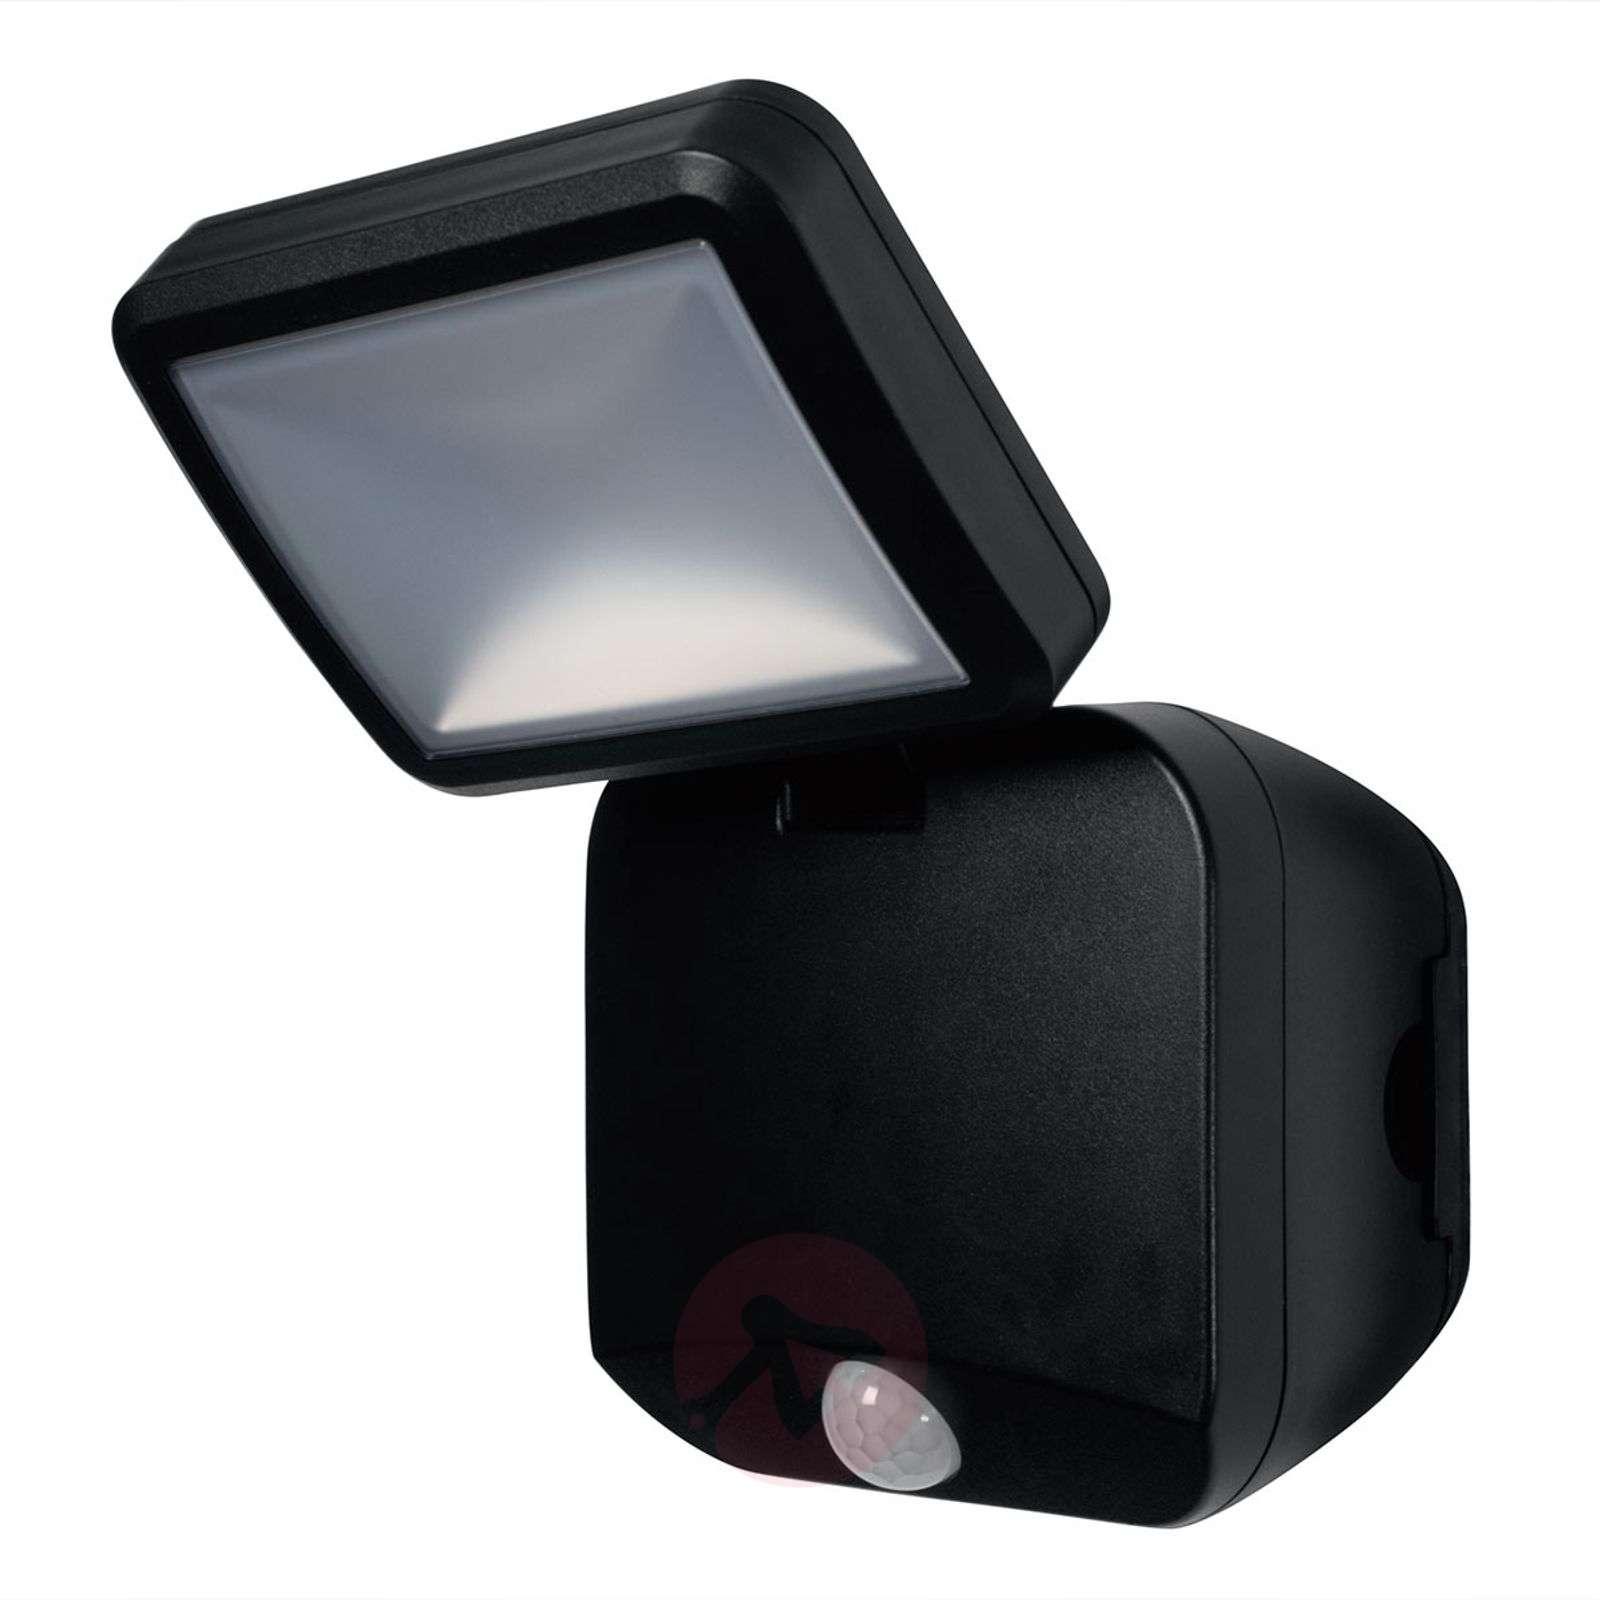 OSRAM Battery LED Spotlight wall lamp one-bulb-7261488-01